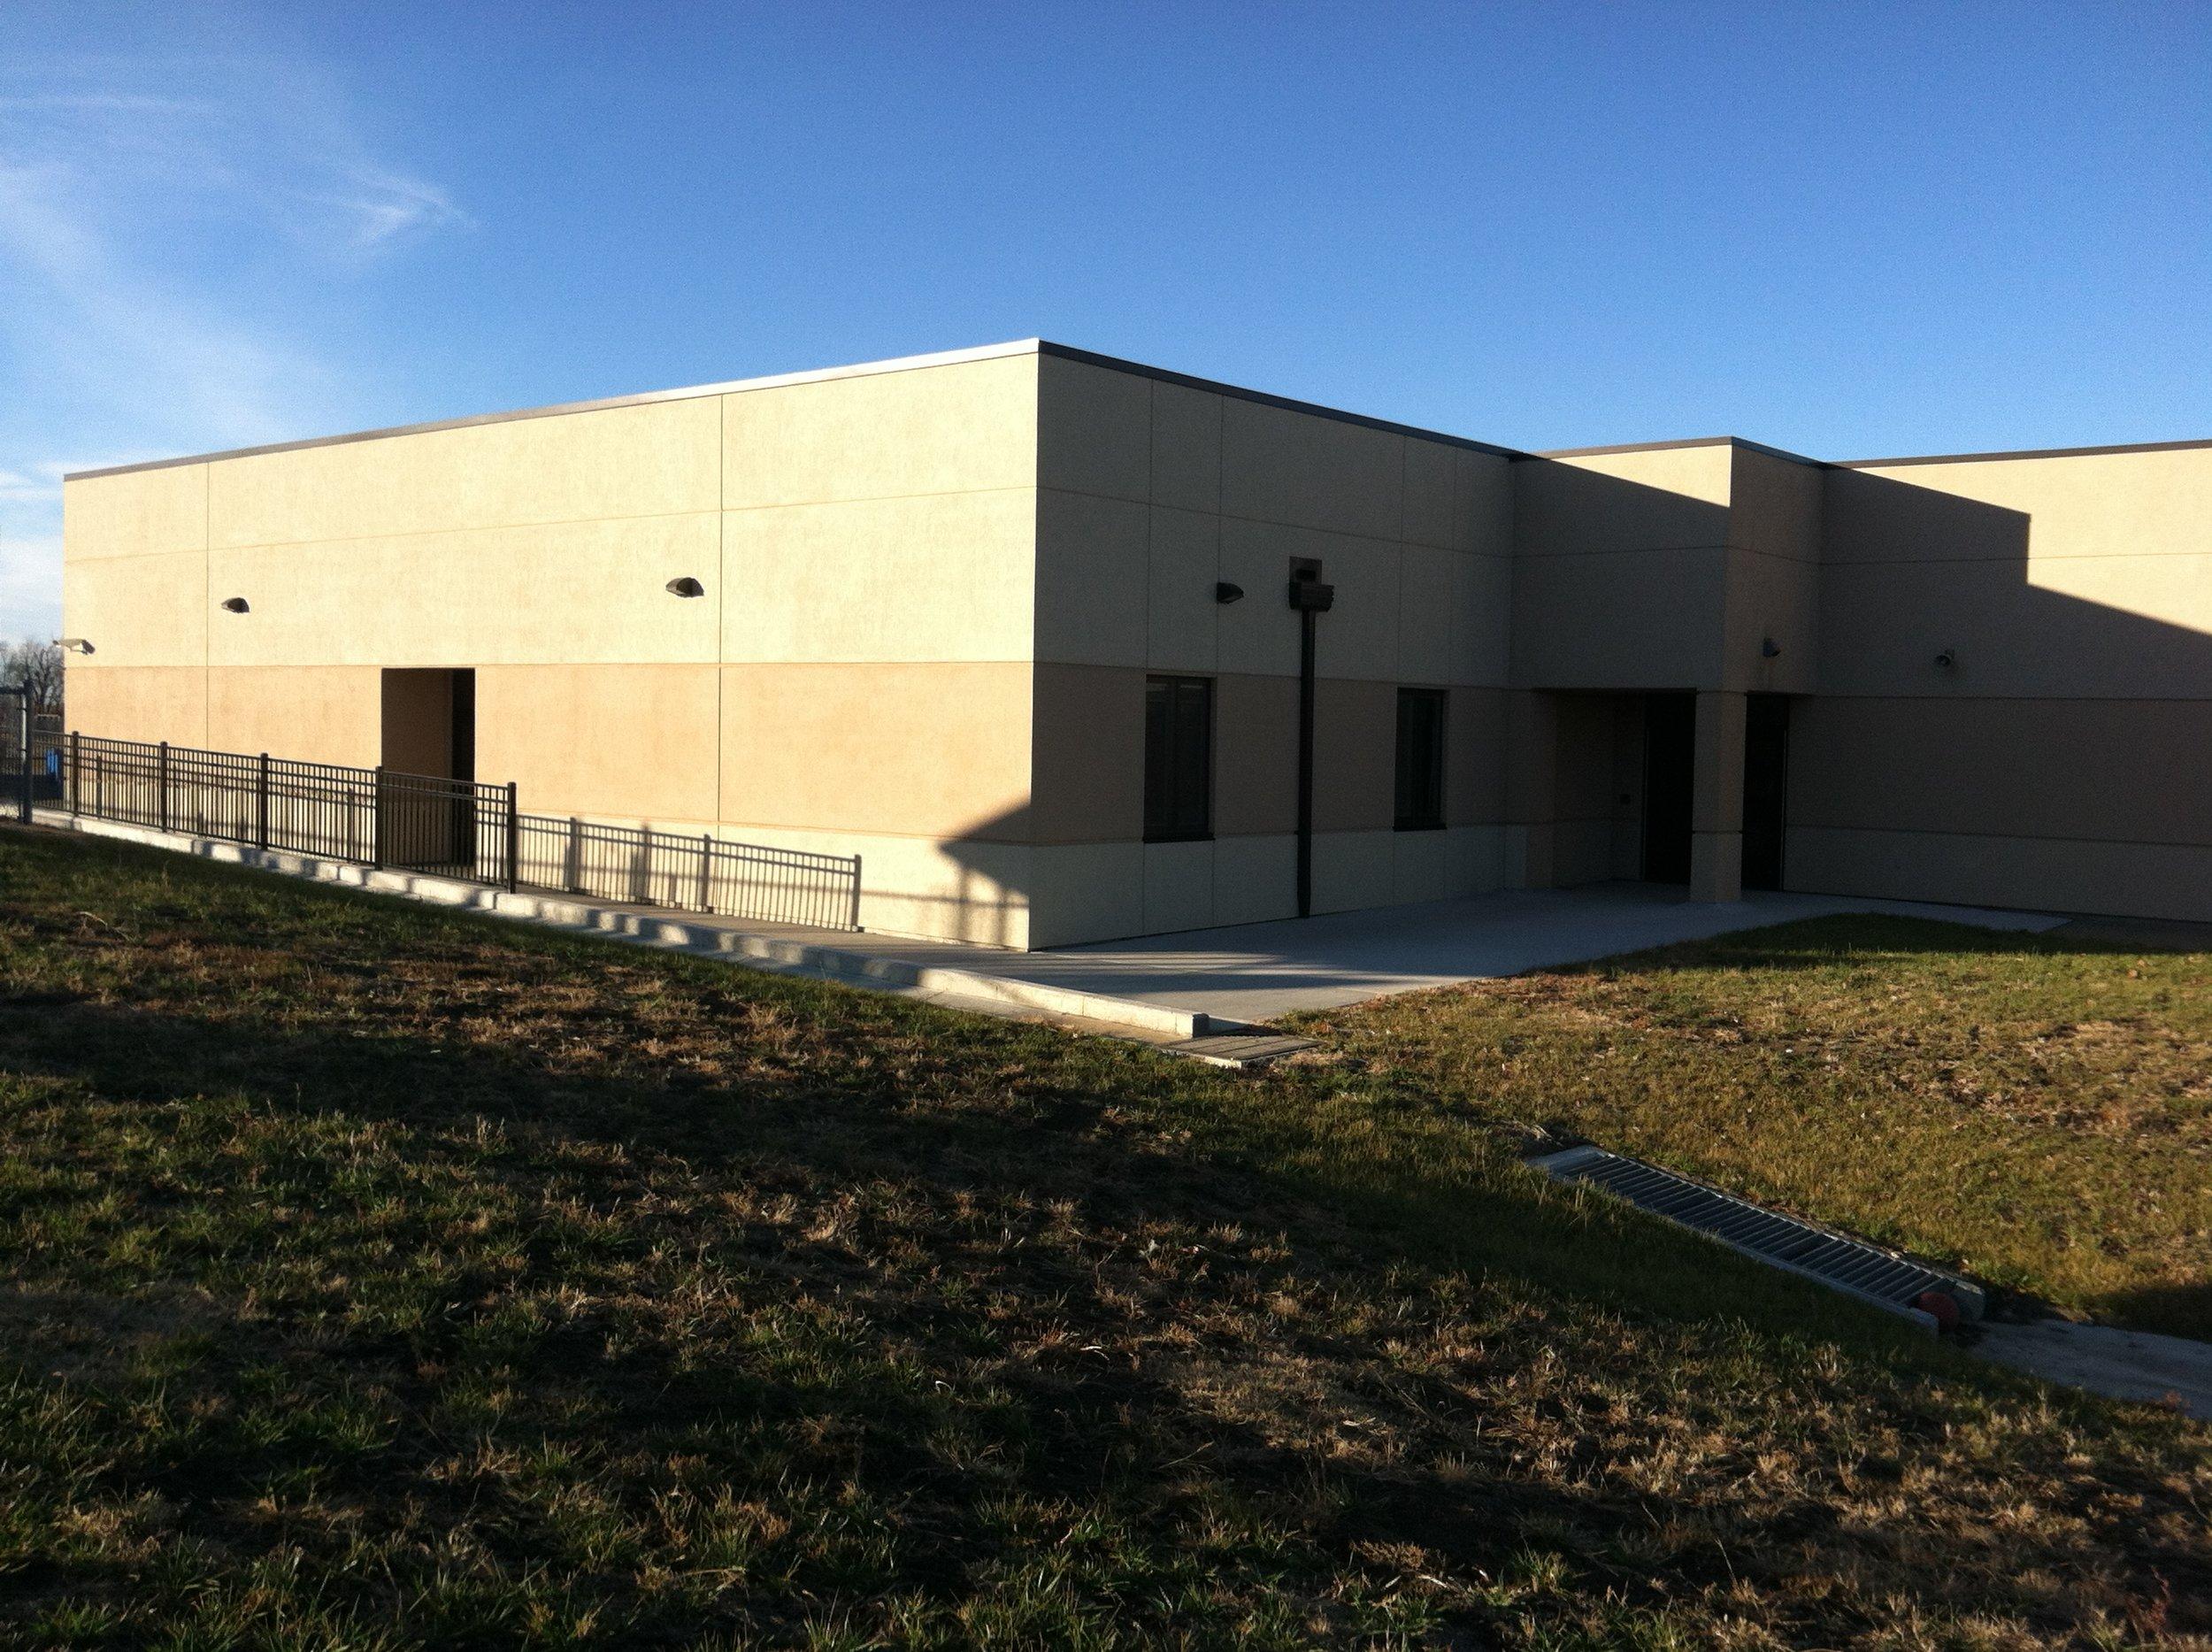 Jay Shideler Elementary School Addition   Client: USD 437 Auburn Washburn Architect: HTK Architects